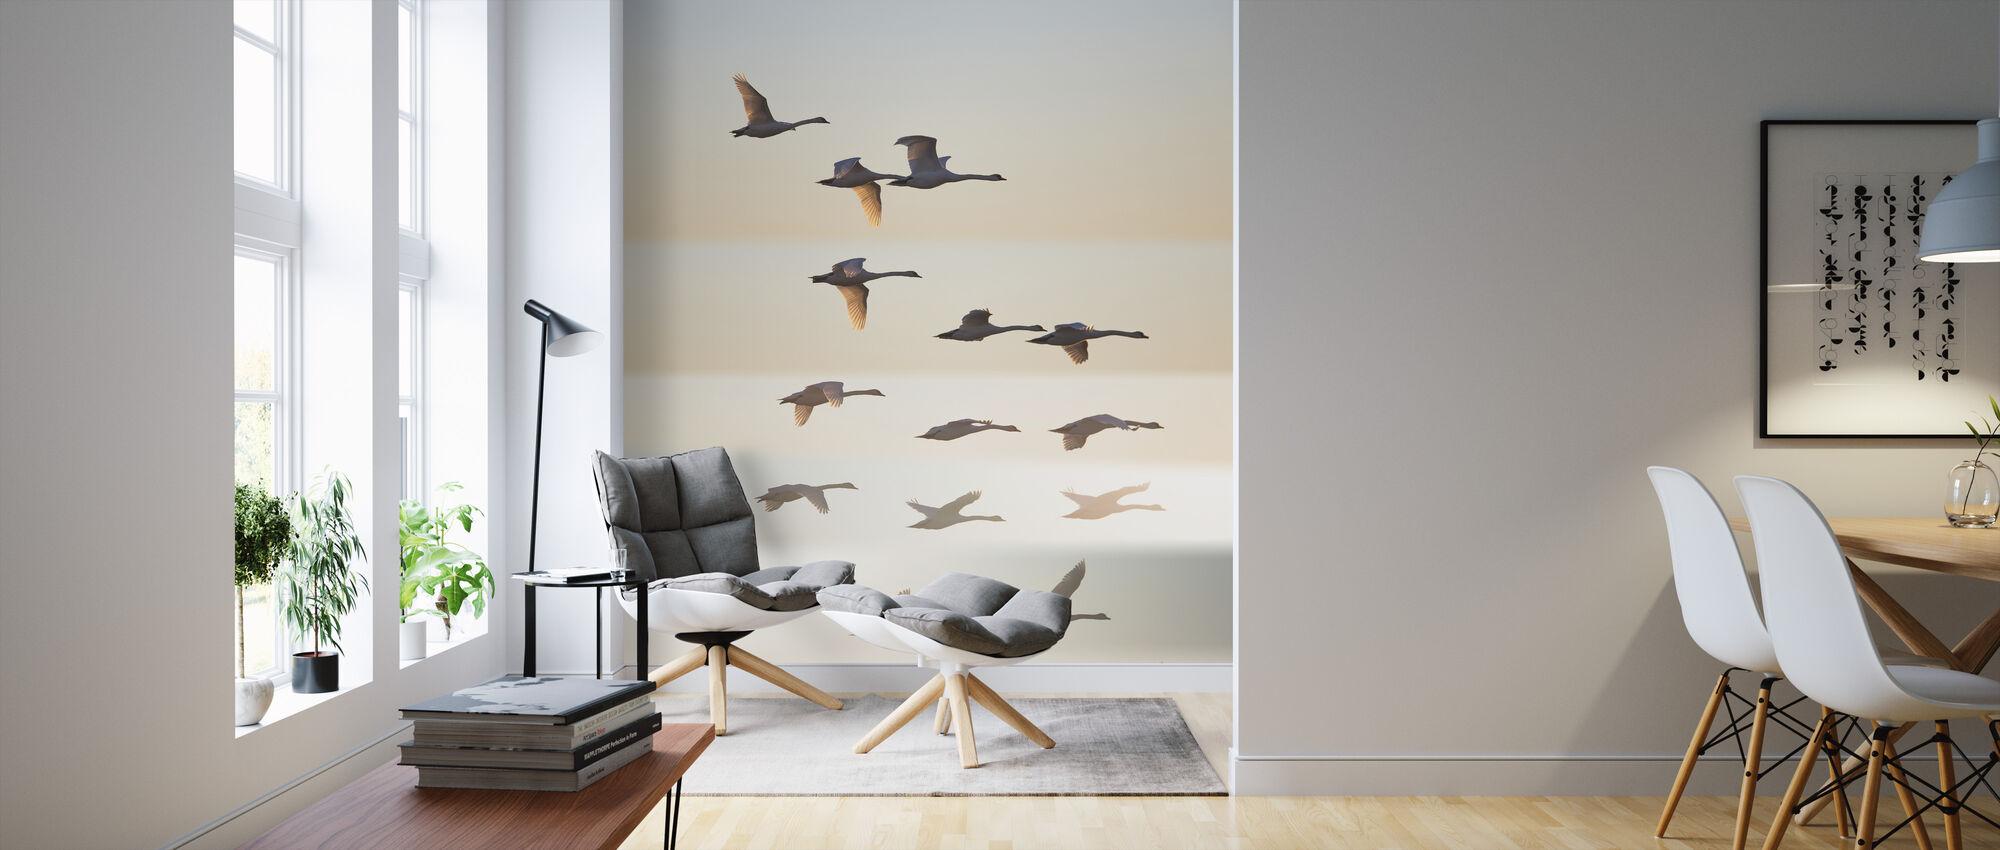 Past the Sun - Wallpaper - Living Room